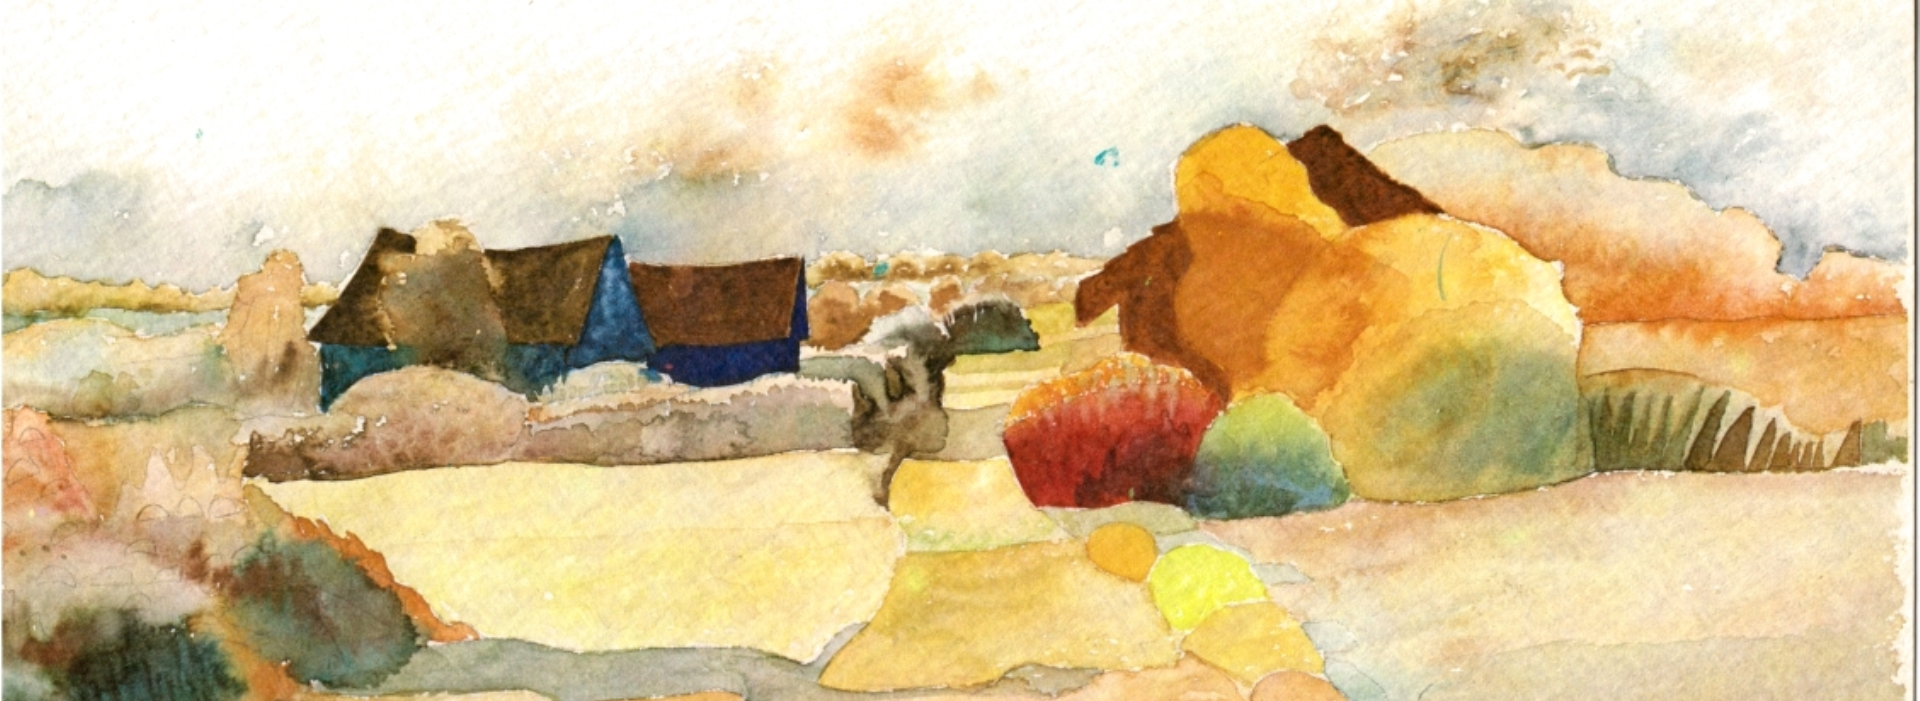 Die Landschaft als Inspirationswert